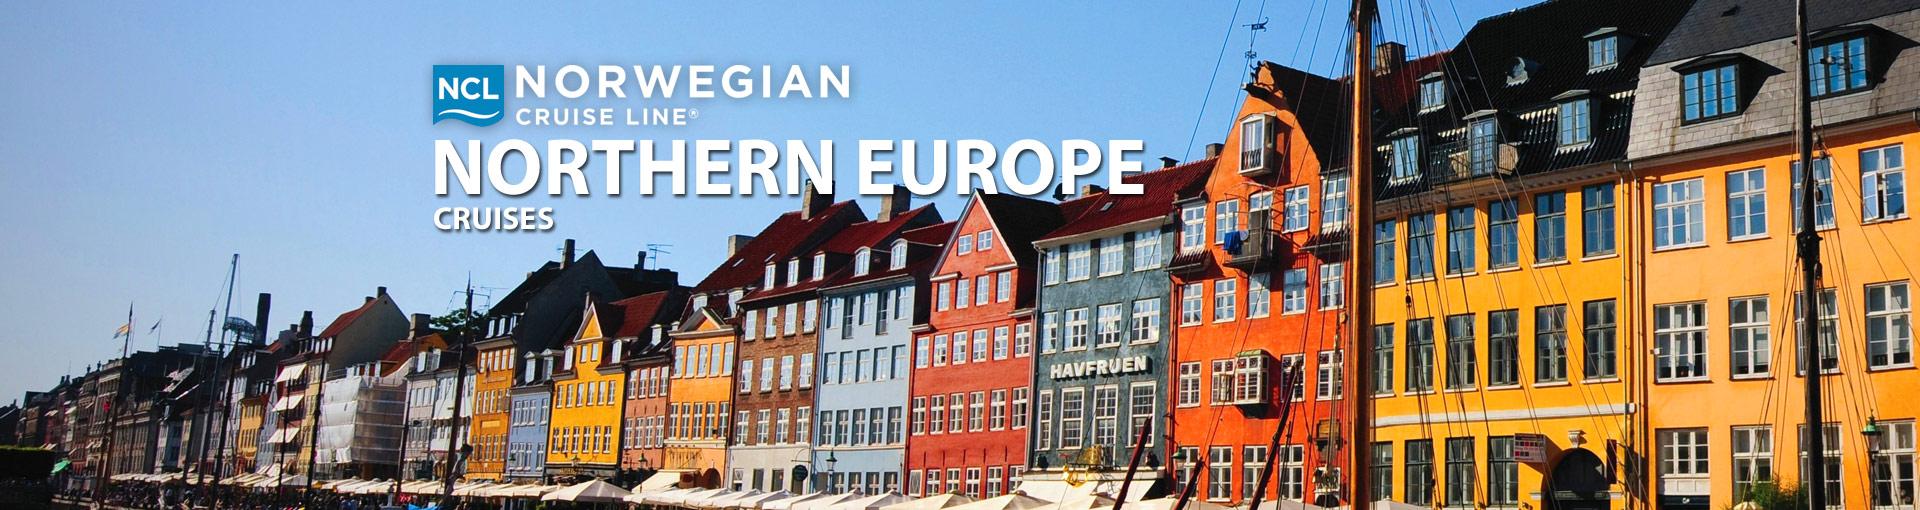 Norwegian Northern Europe Cruises 2017 And 2018 Northern